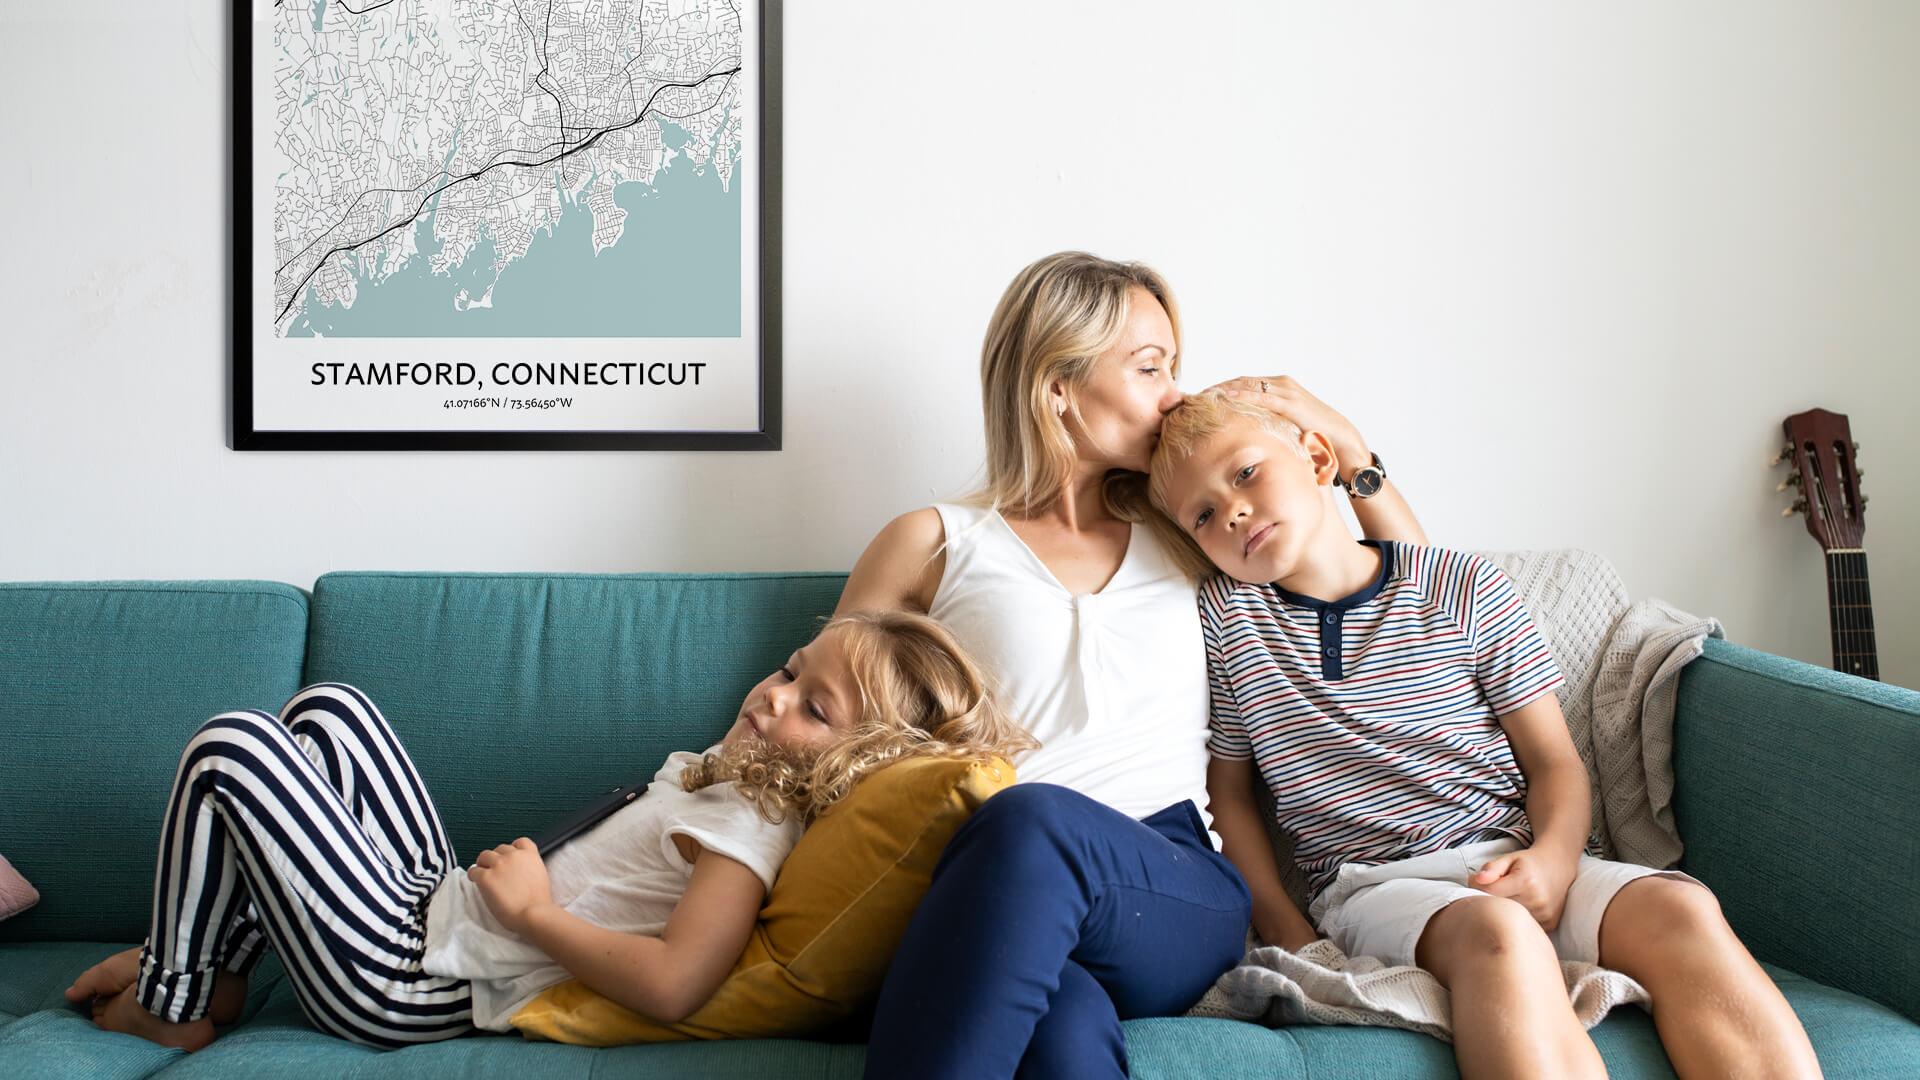 Stamford map poster